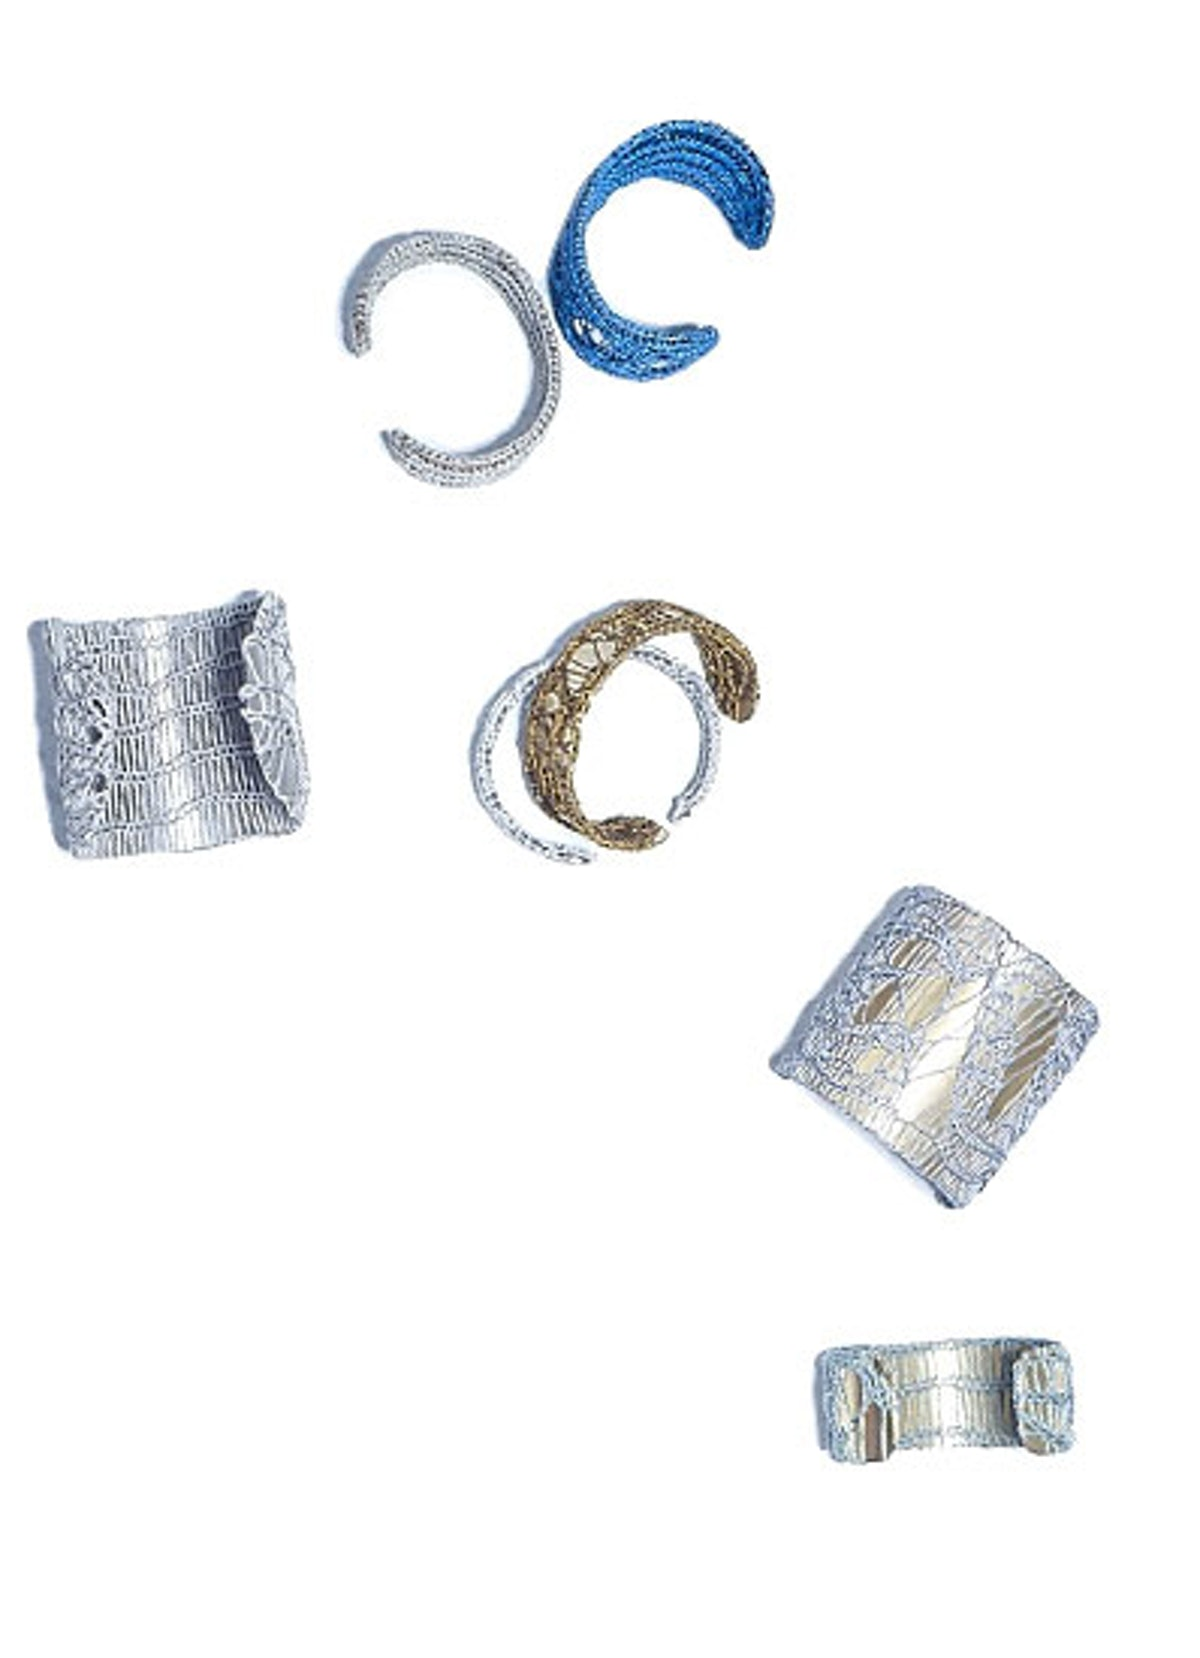 acss-brooklyn-jewelry-01-v.jpg